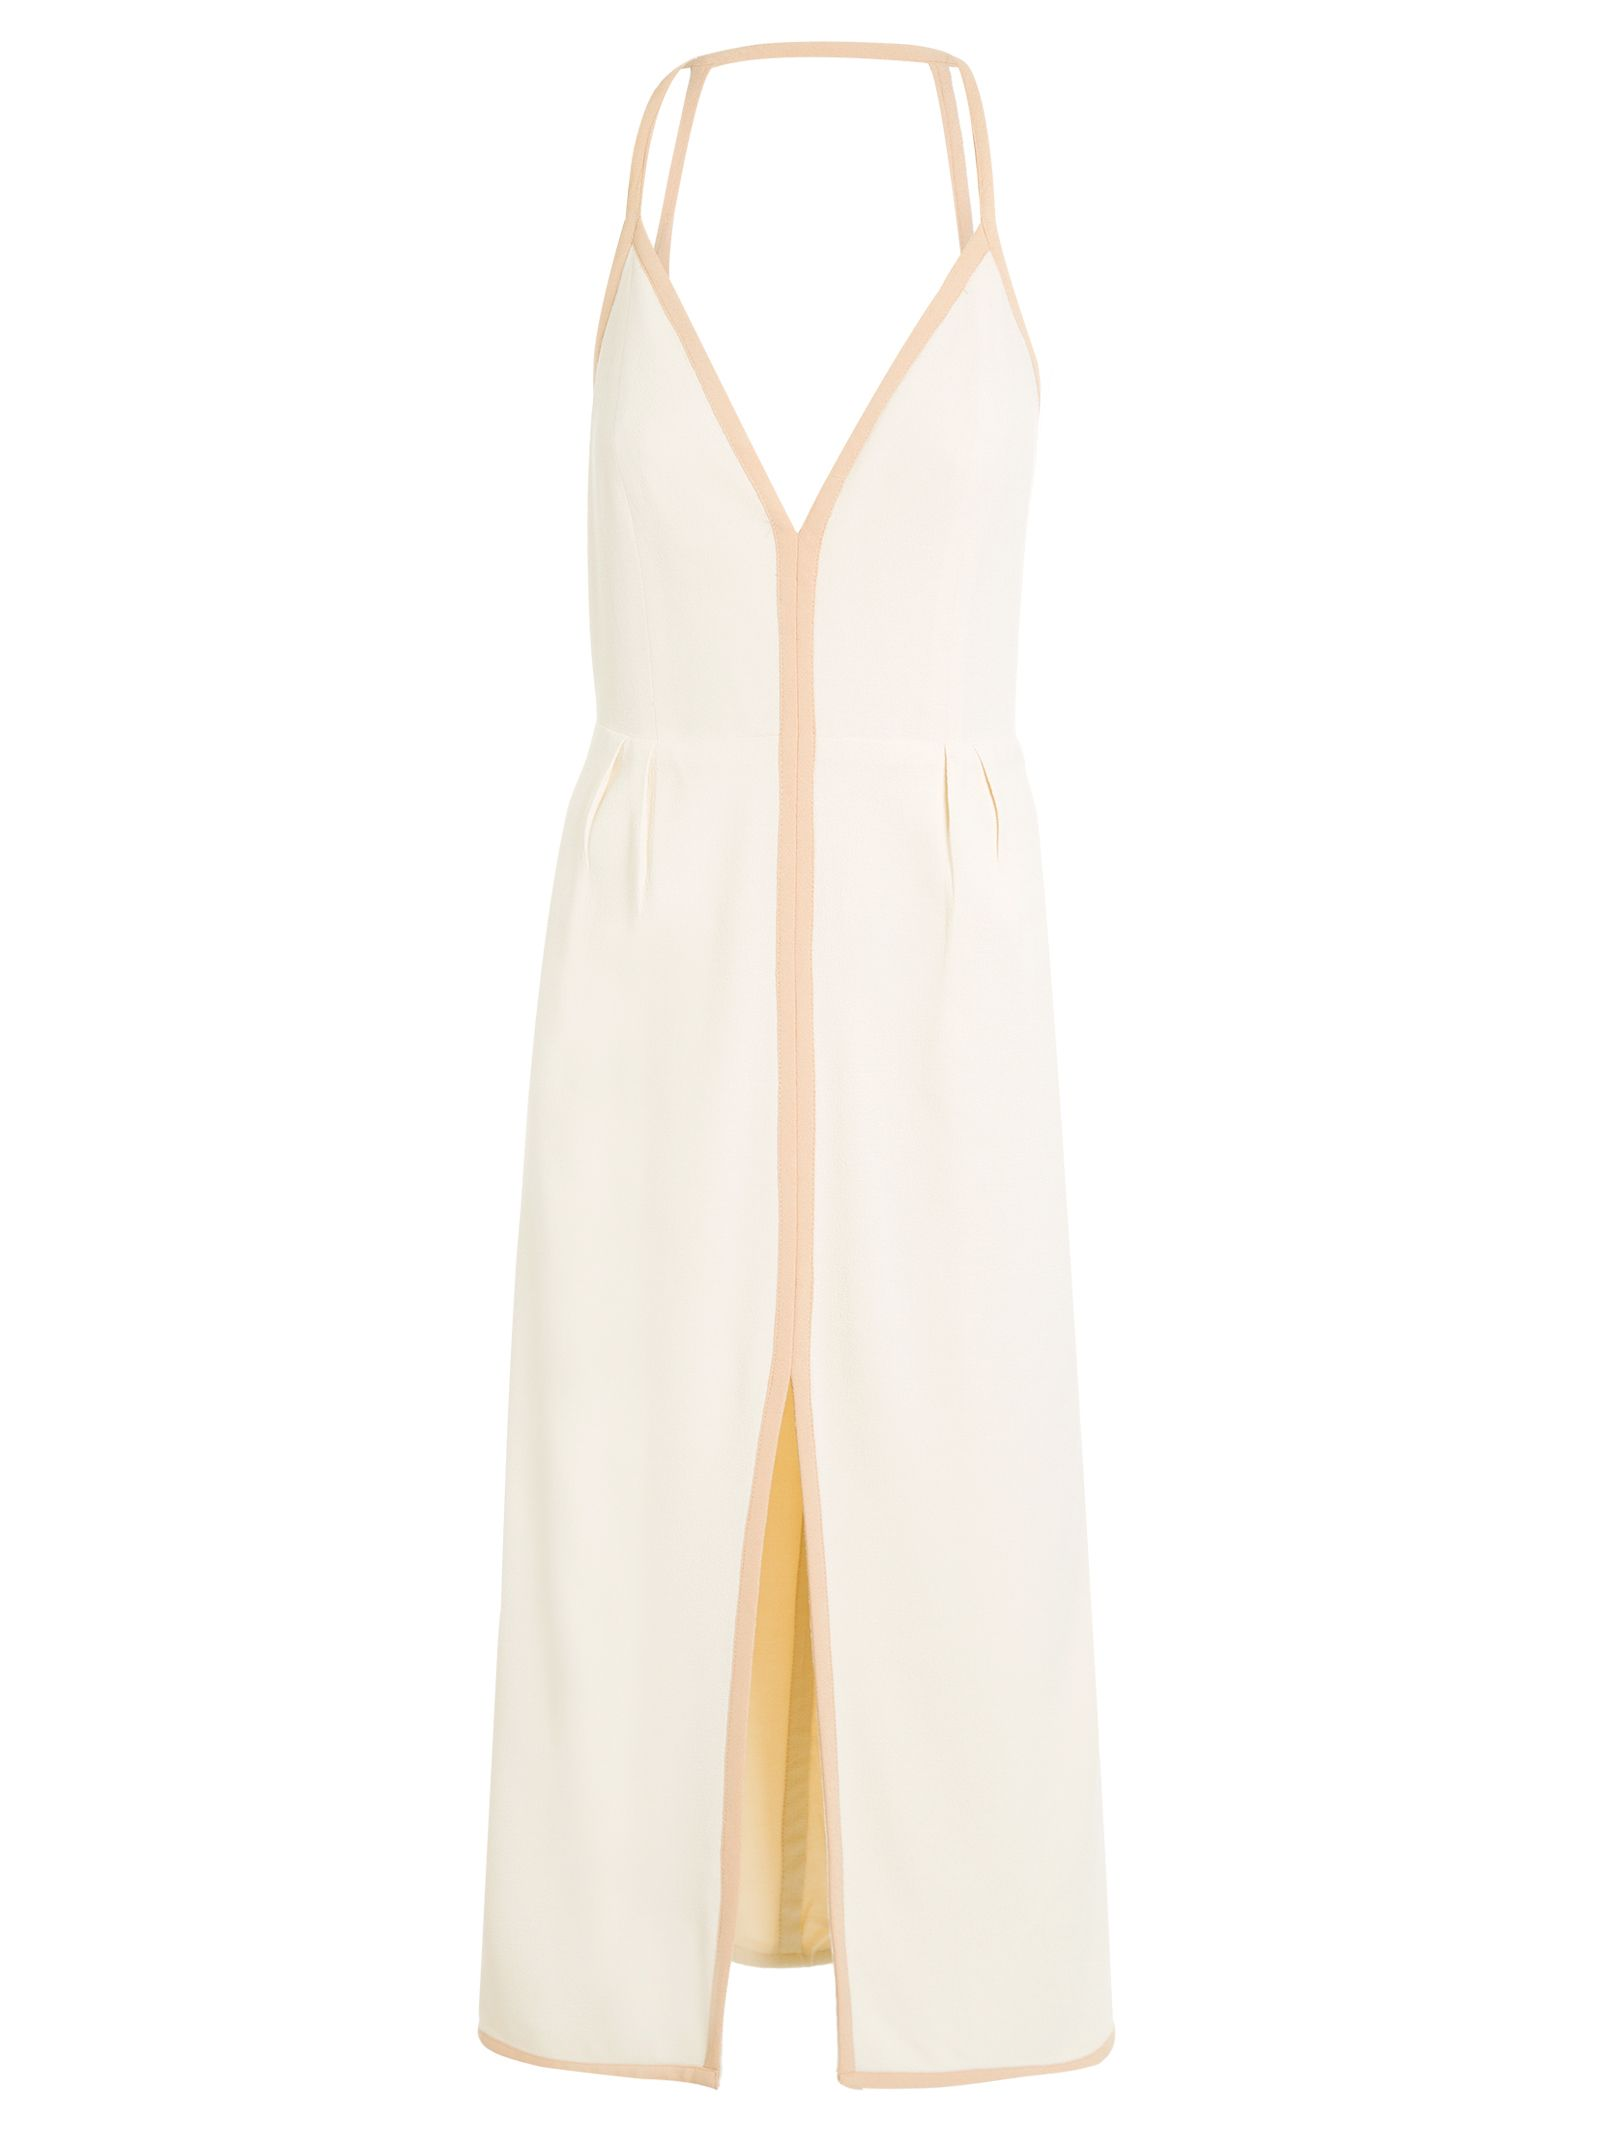 7232f865b Vestido Demi - Cris Barros - Nude - Shop2gether   vestido em 2019 ...